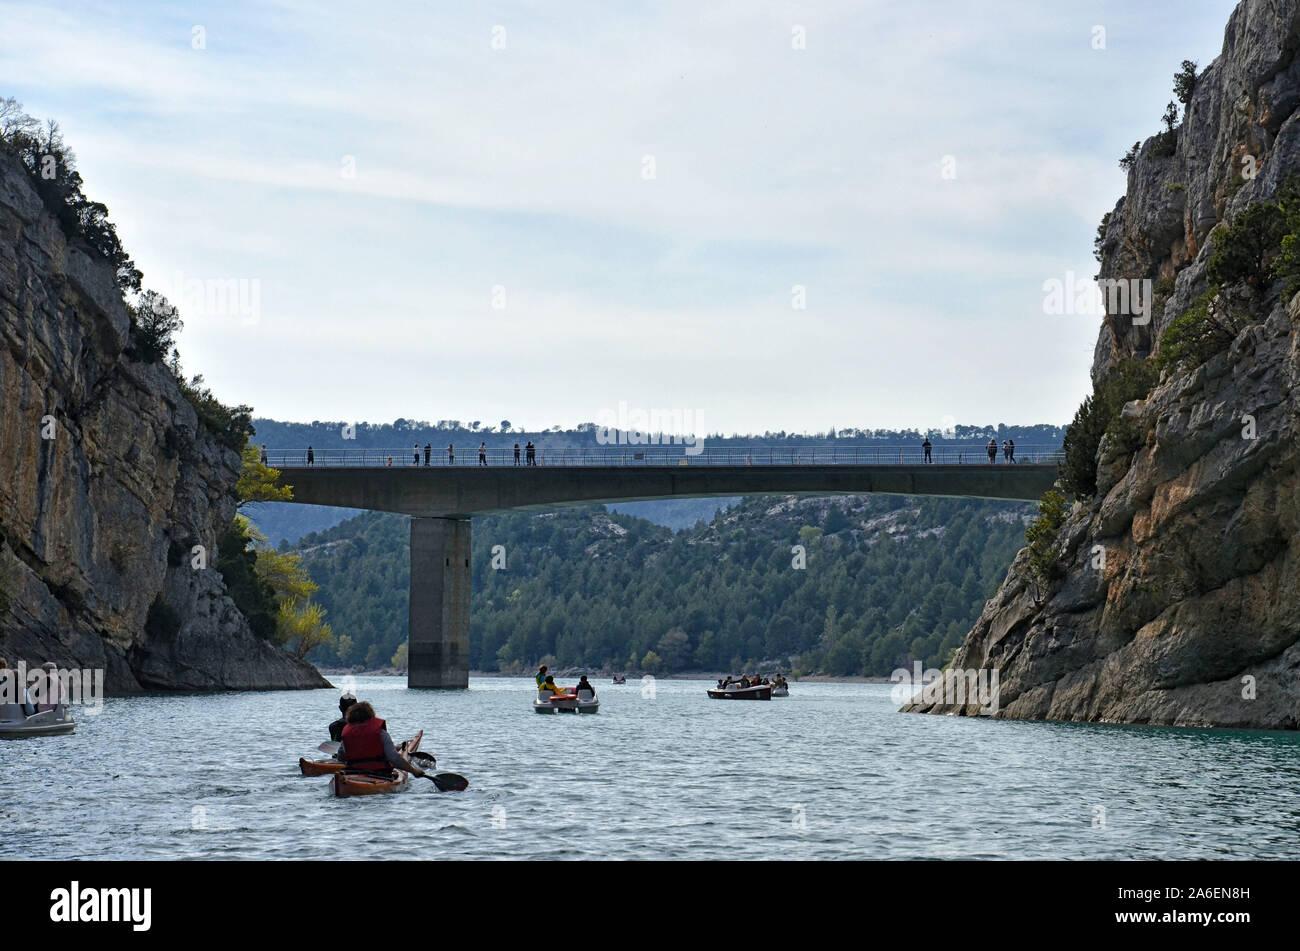 Bridge of Galetas over river Verdon and lake of Sainte Croix. Alpes de Hautes Provence France Stock Photo